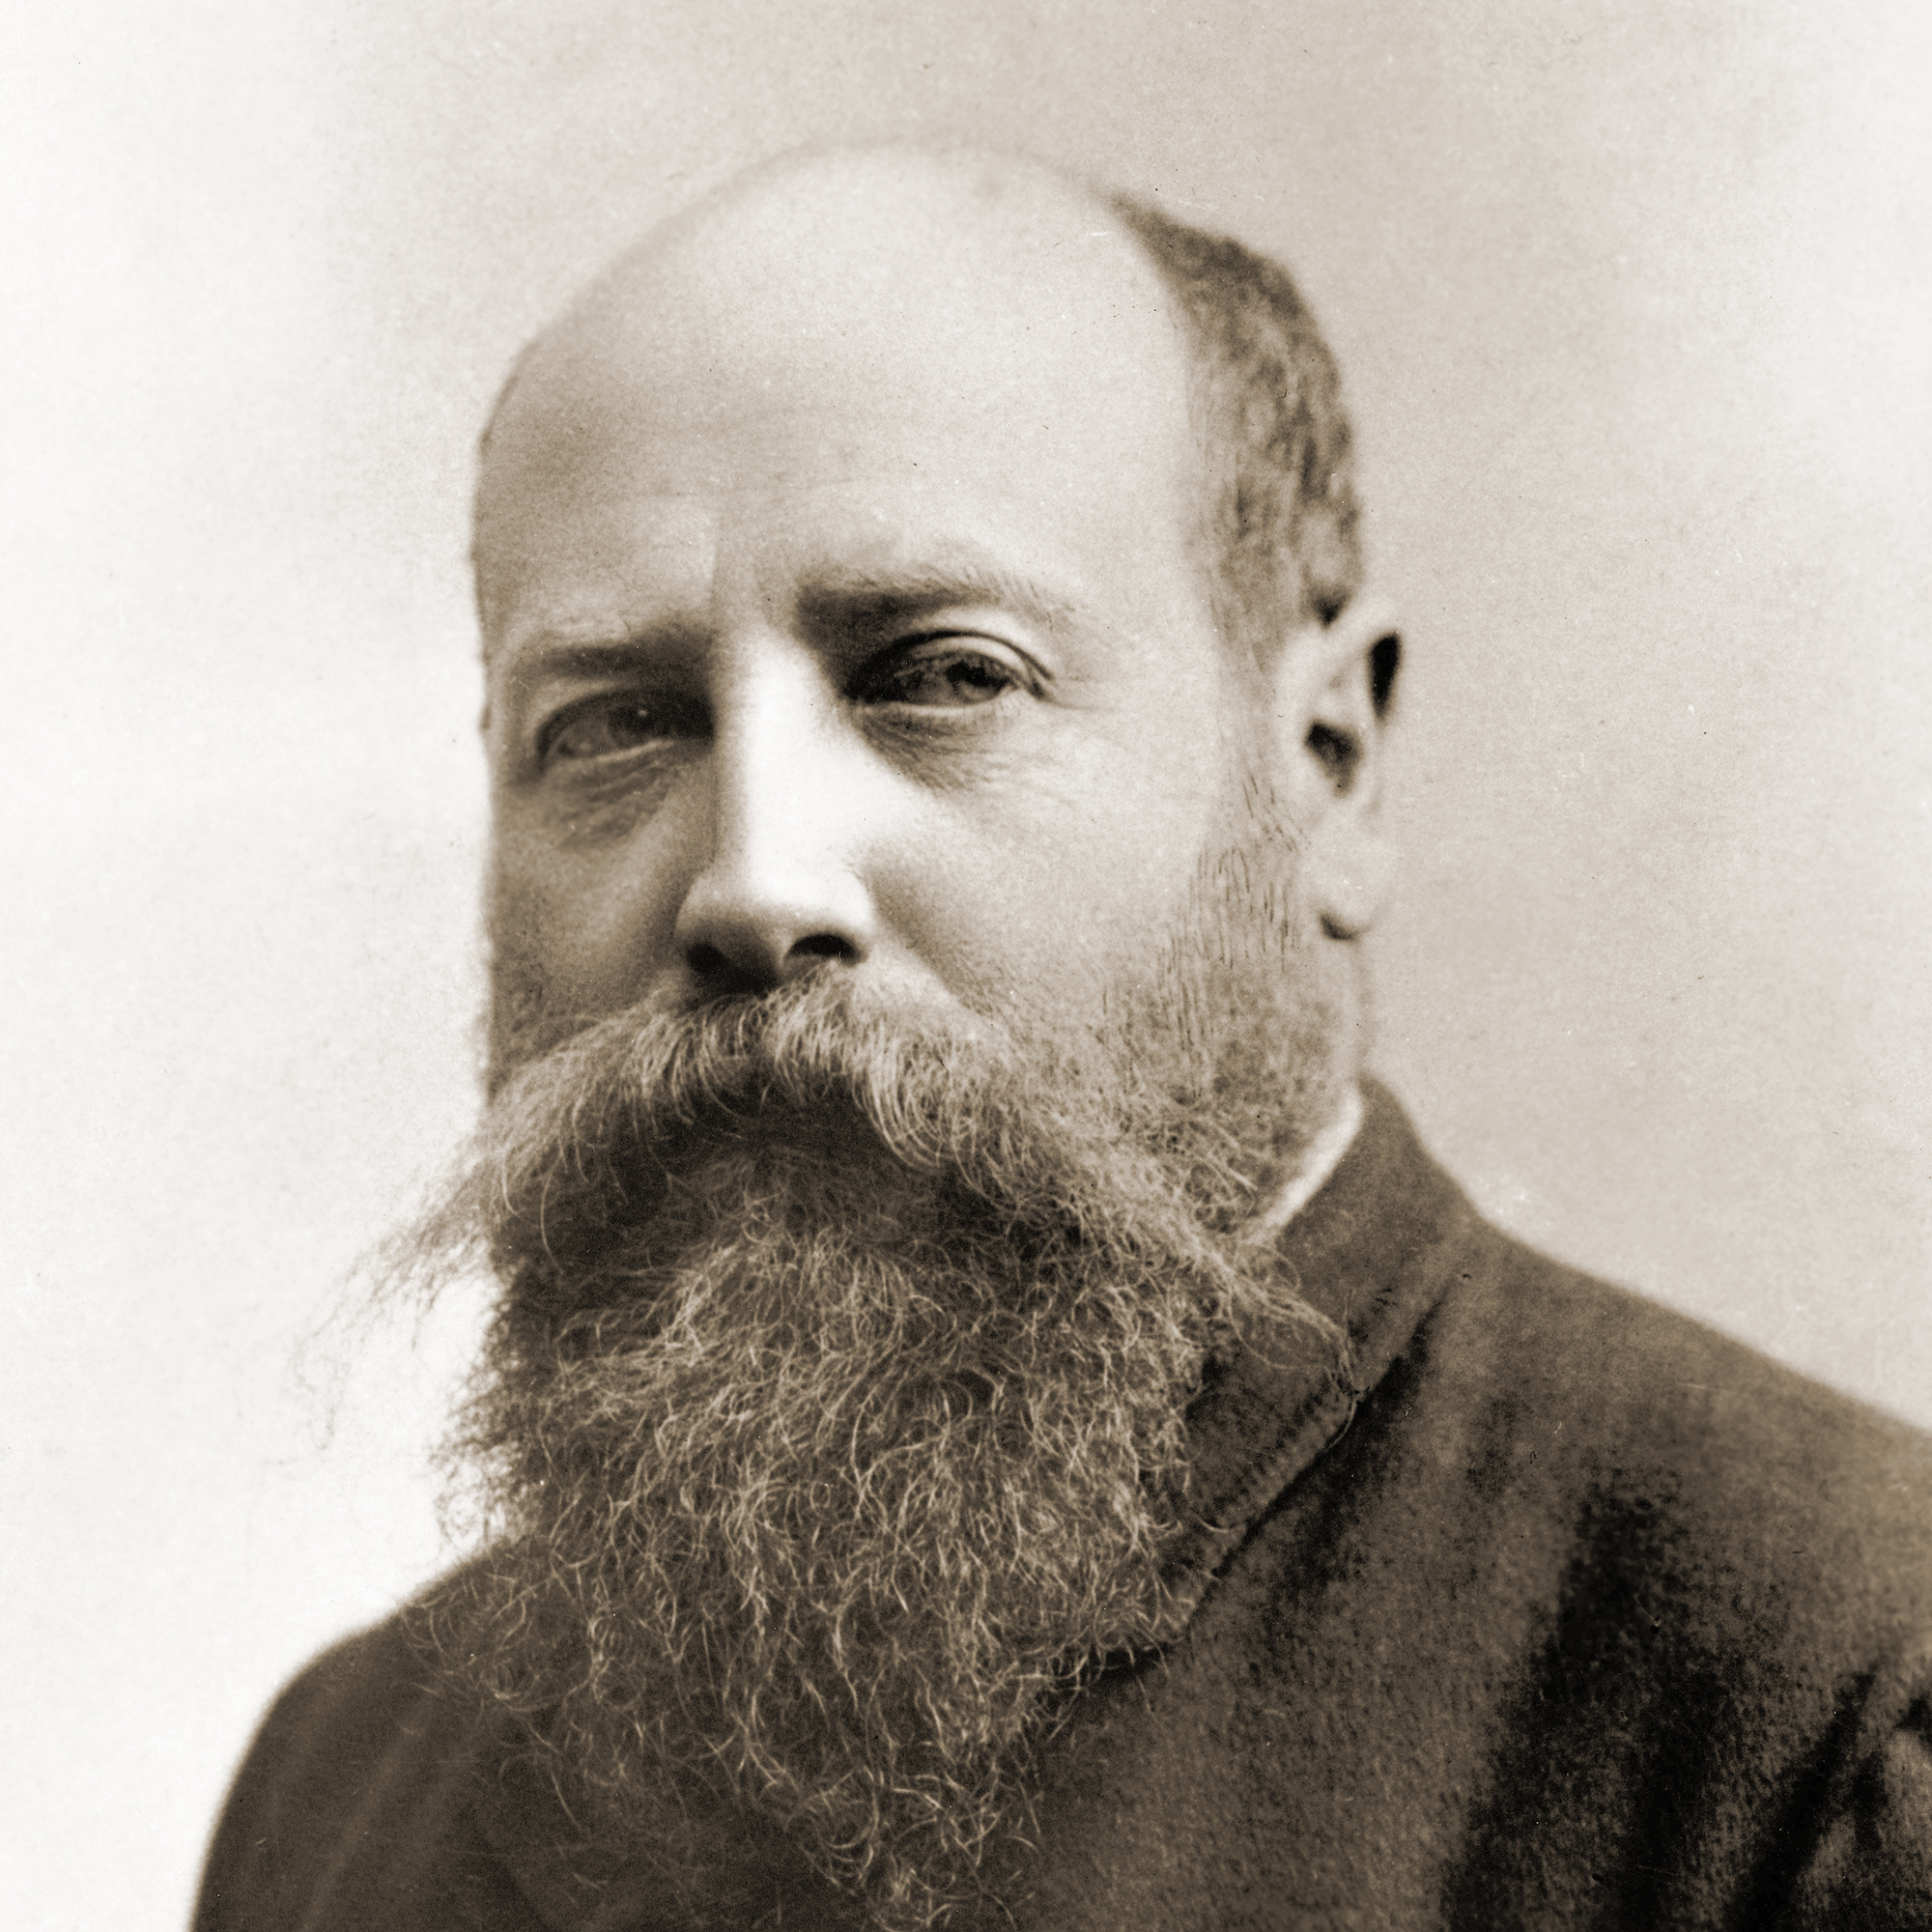 Christian Krohg